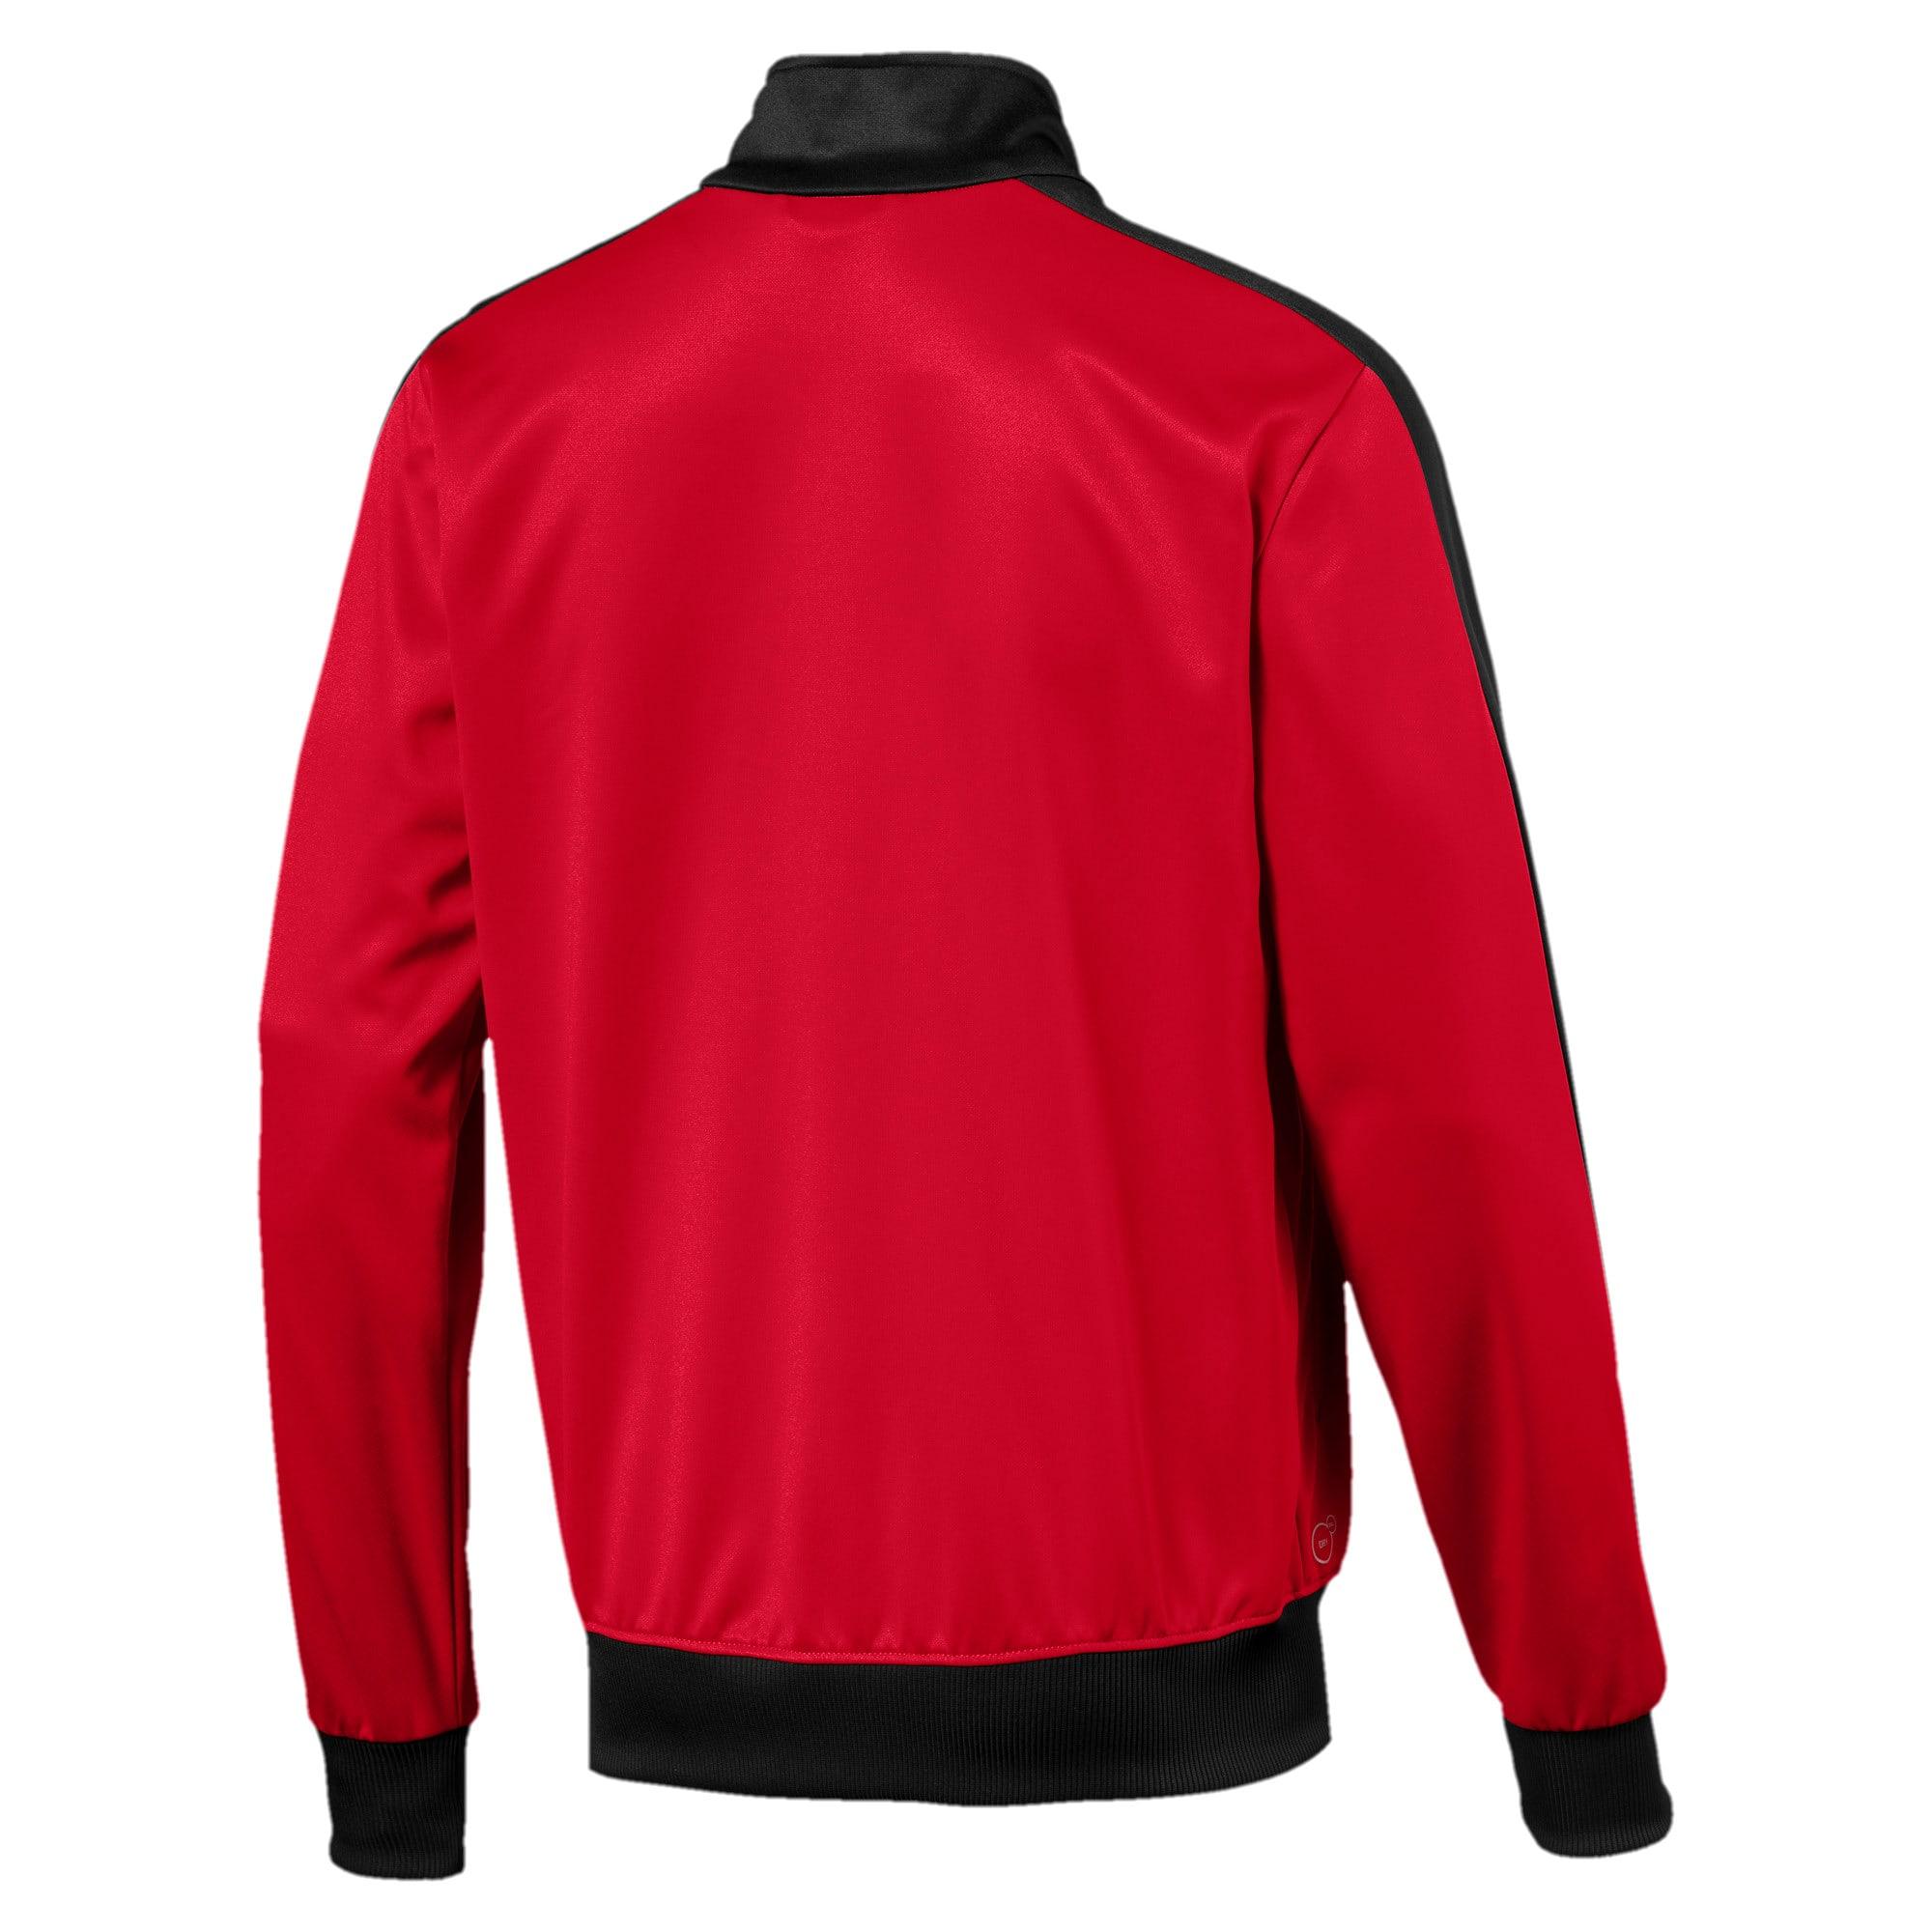 Thumbnail 2 of AC Milan Men's T7 Track Jacket, Tango Red-Puma Black, medium